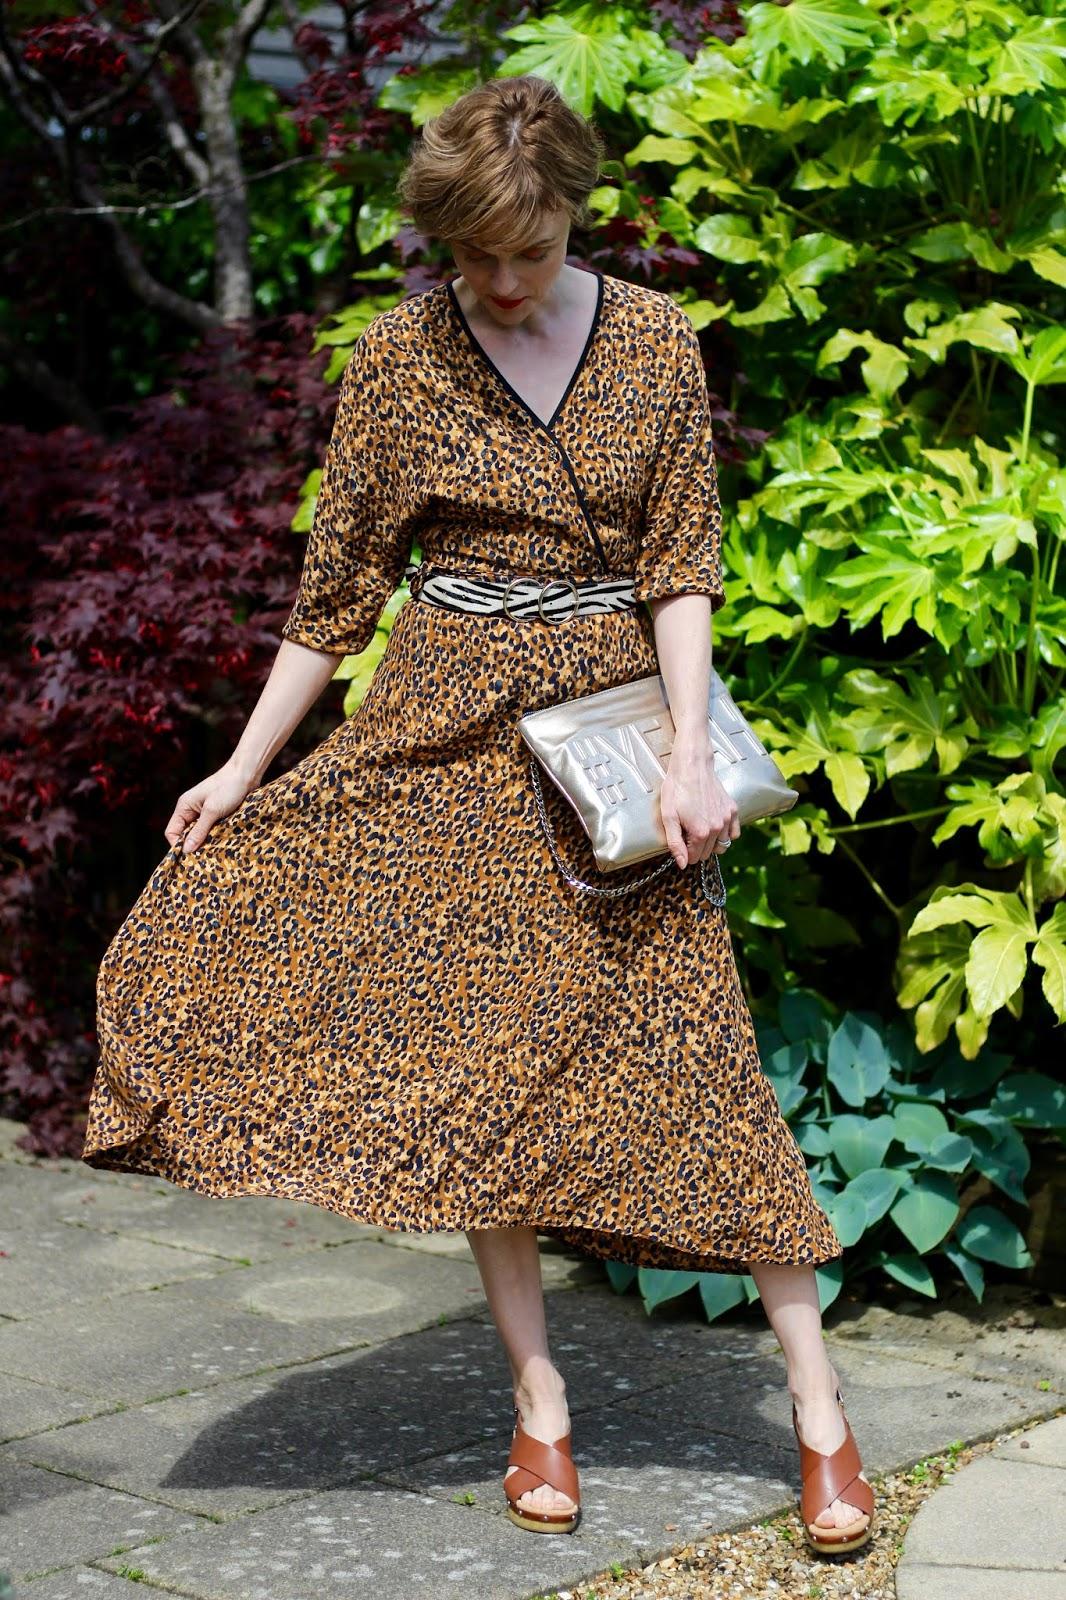 Leopard midi dress, zebra belt and tan sandals | Fake Fabulous